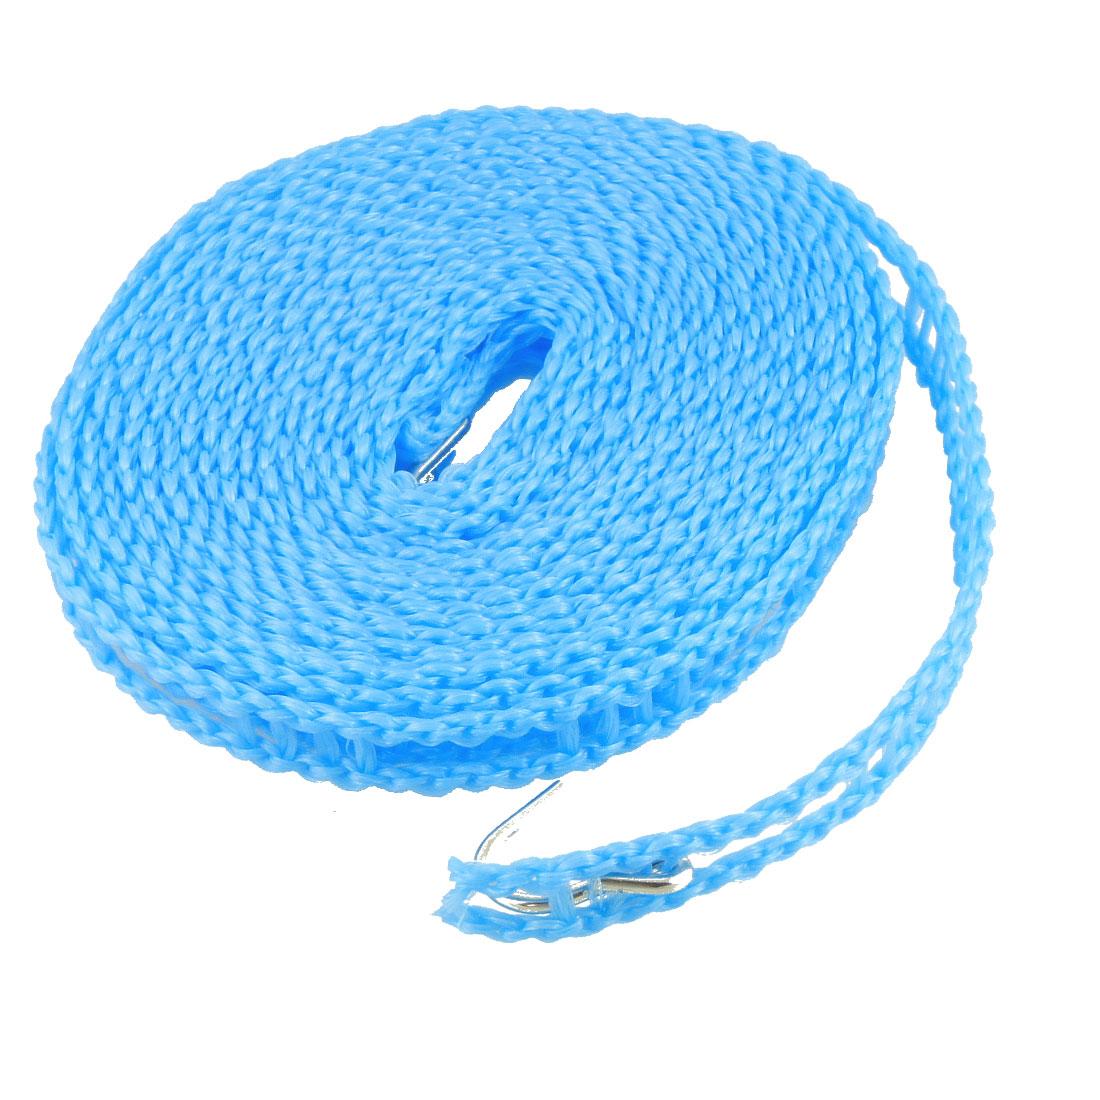 Blue Stockade Style Plastic Nonslip Laundry Line w 2 Metal Hooks